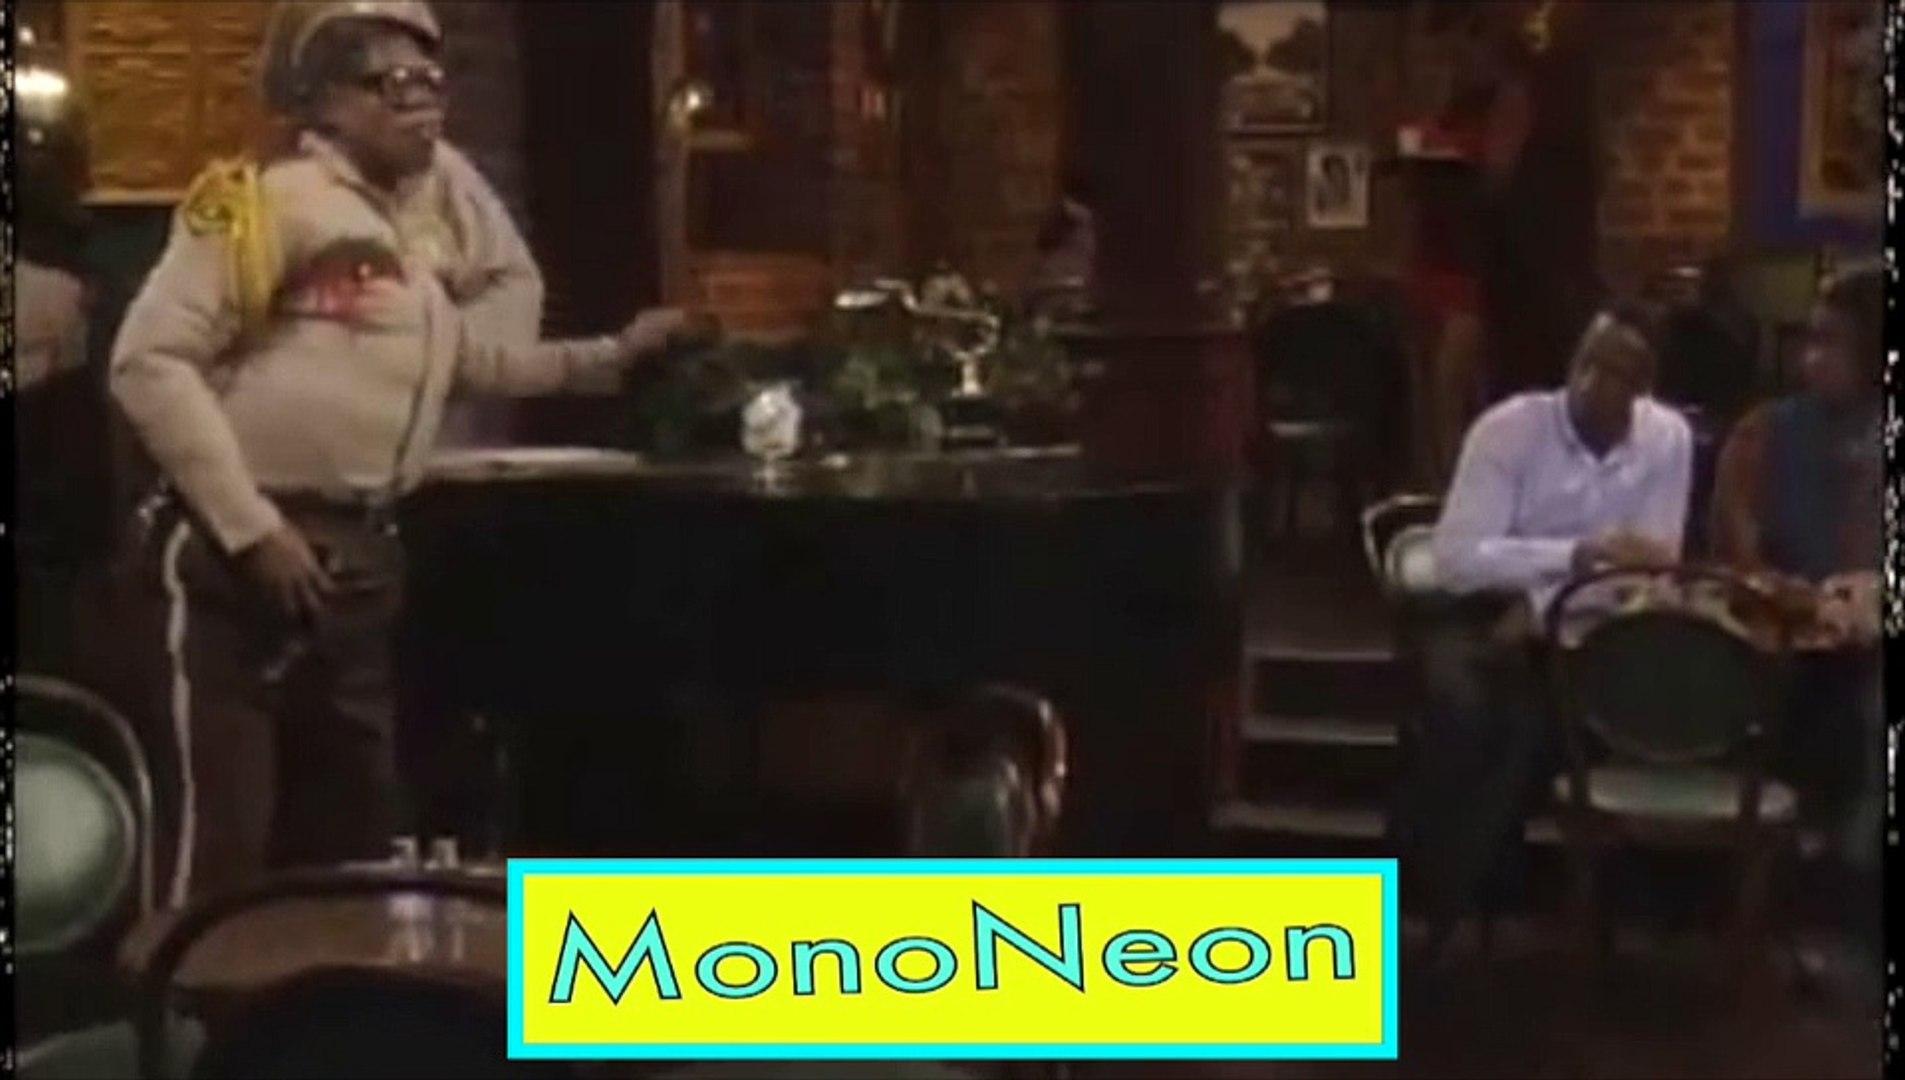 MonoNeon: Martin Lawrence as Otis